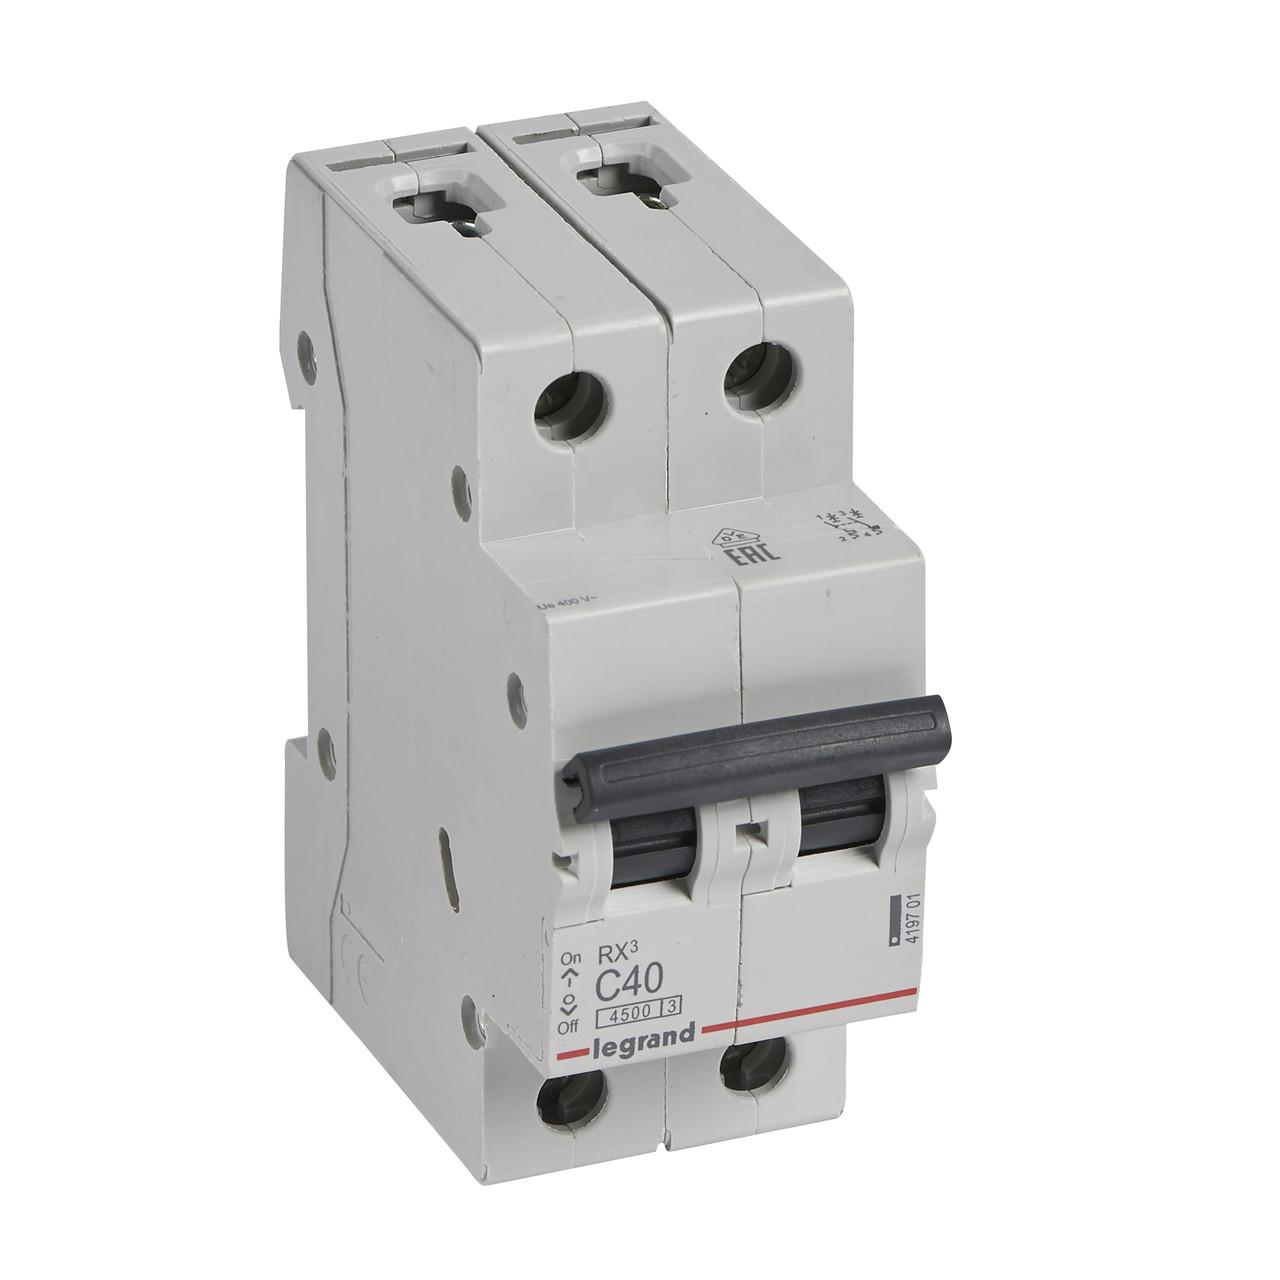 2 пол., 40А, 4,5кА, С, Legrand, Автоматичний вимикач, RX3 [419701]